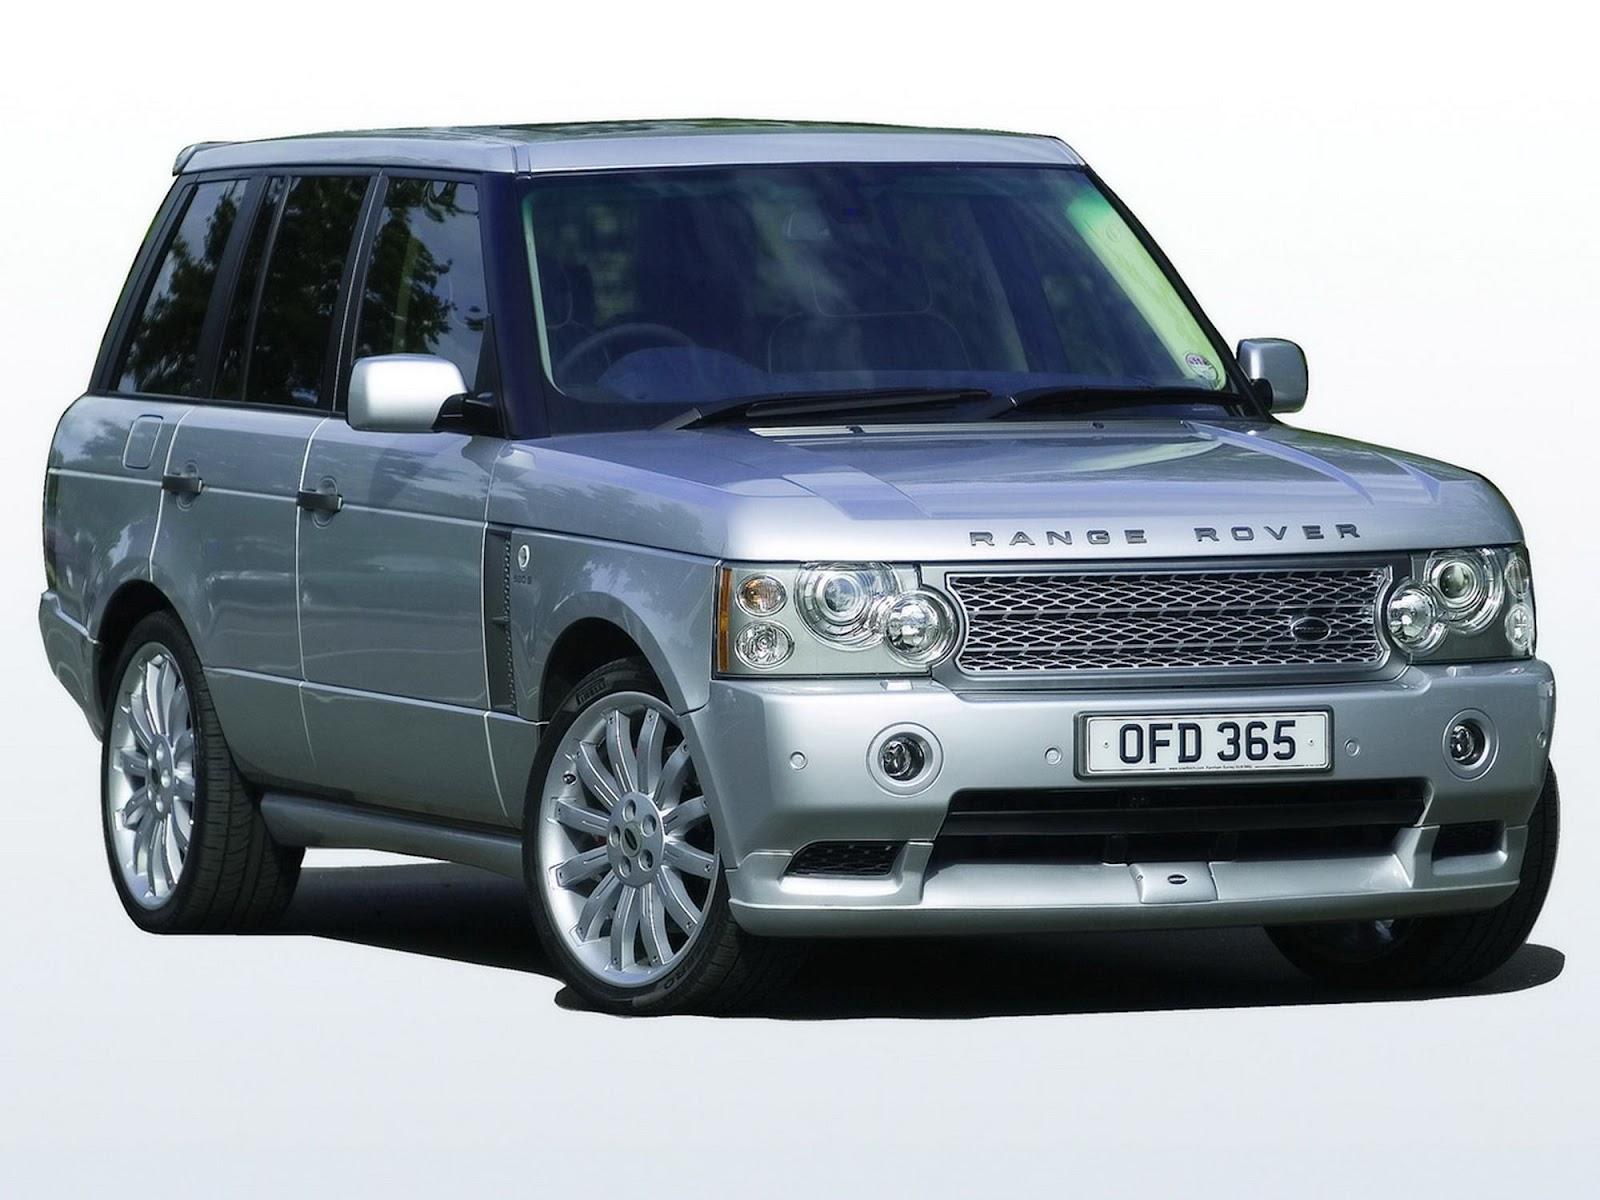 Range Rover HD Wallpapers, Range Rover Evoque HD